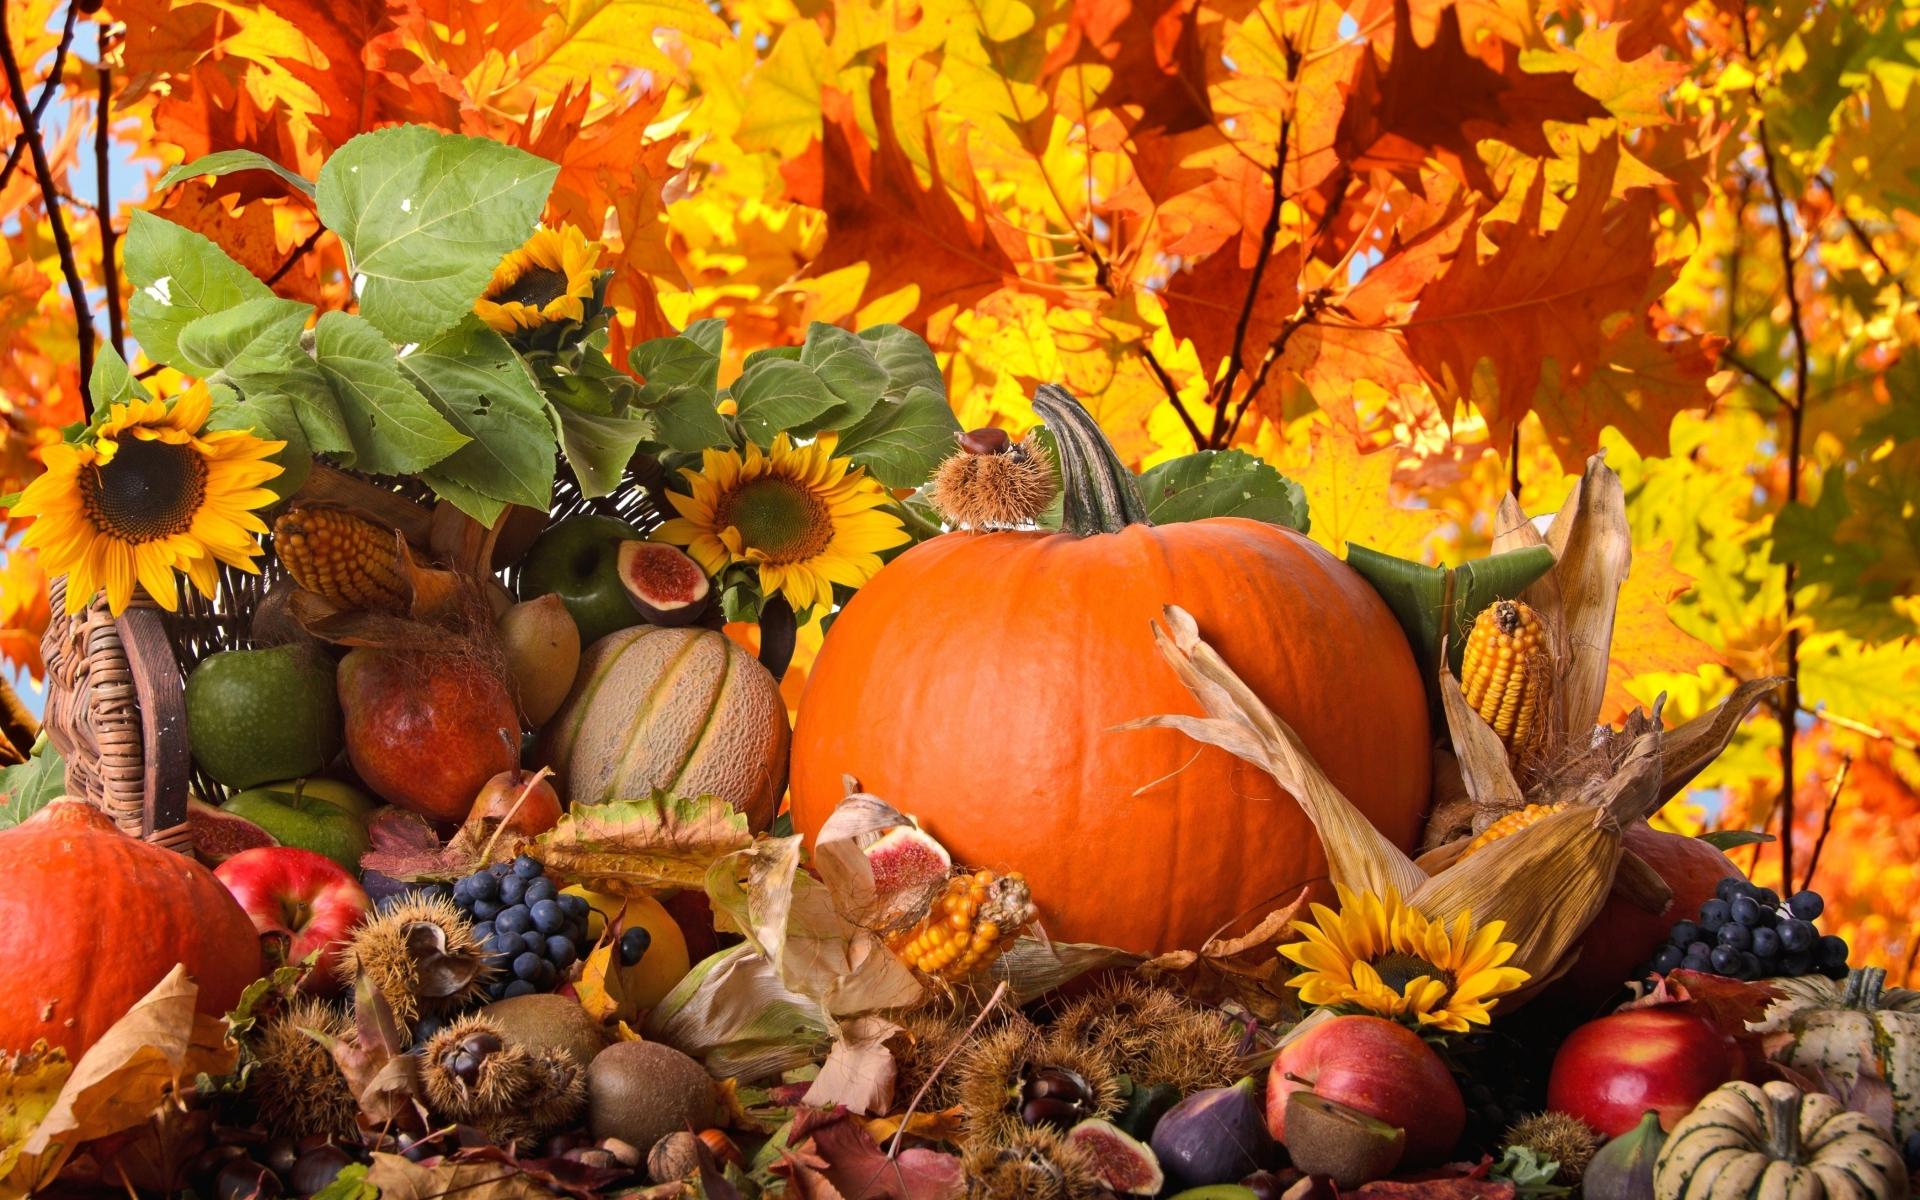 20 Best Thanksgiving Wallpapers for Mac OS X El Capitan 1920x1200